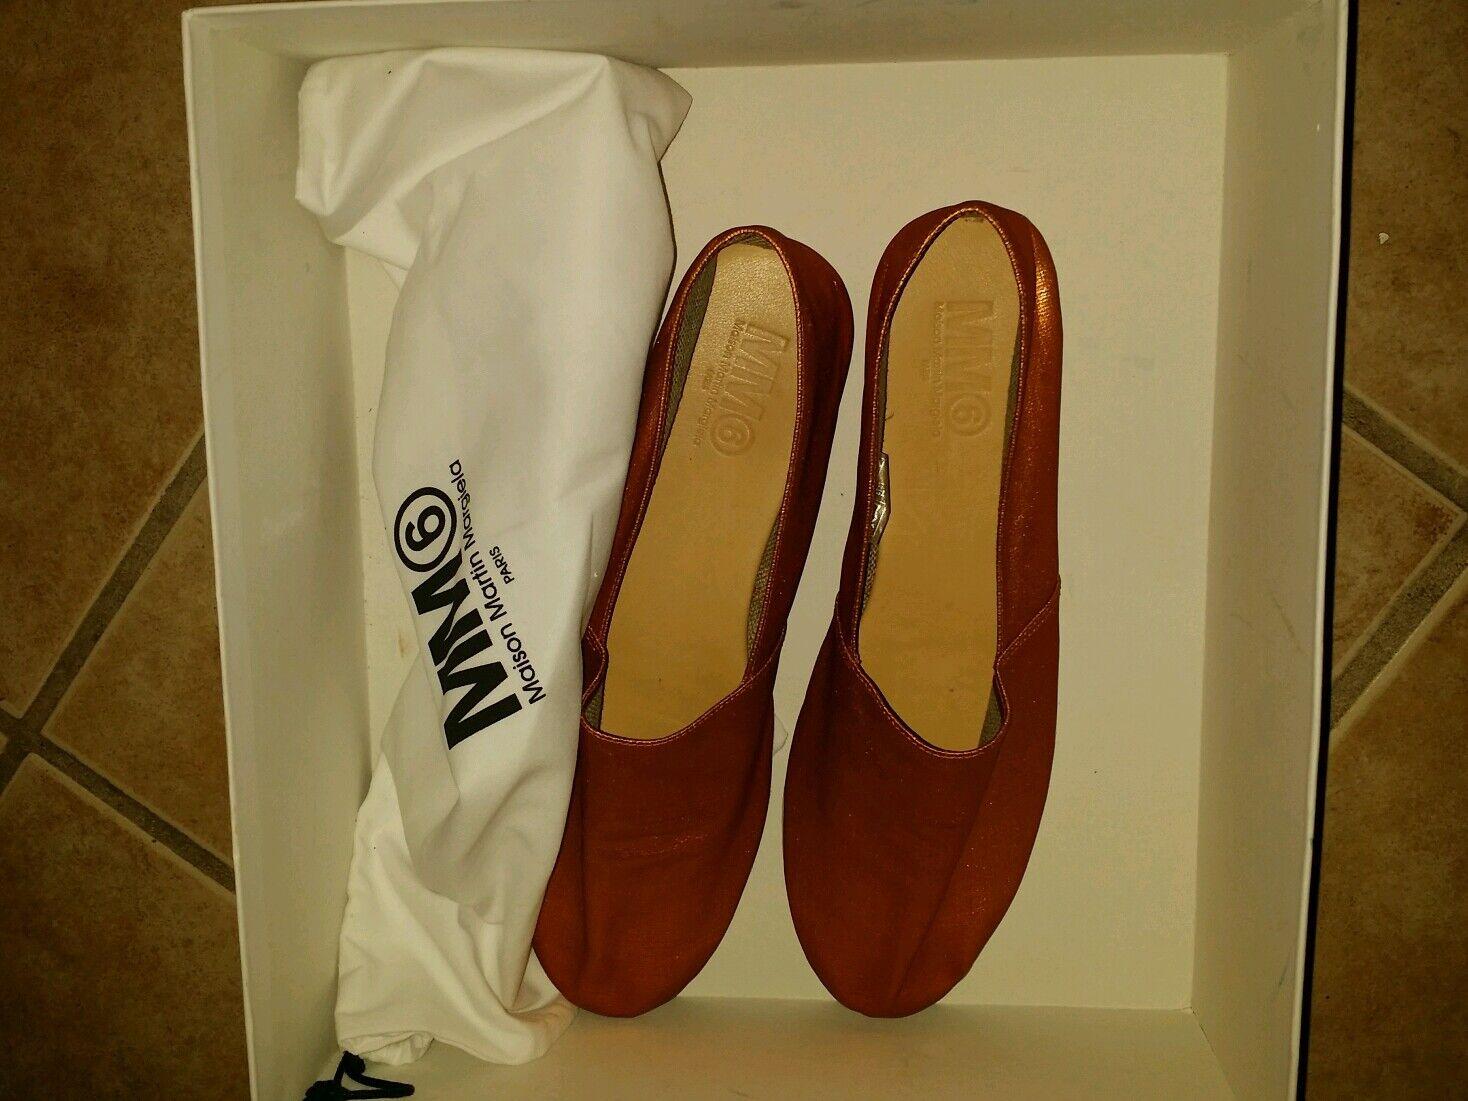 NIB MM6 MAISON MARTIN MARGIELA LOAFERS Women's US Size 7 Euro Size 37-38  shoes